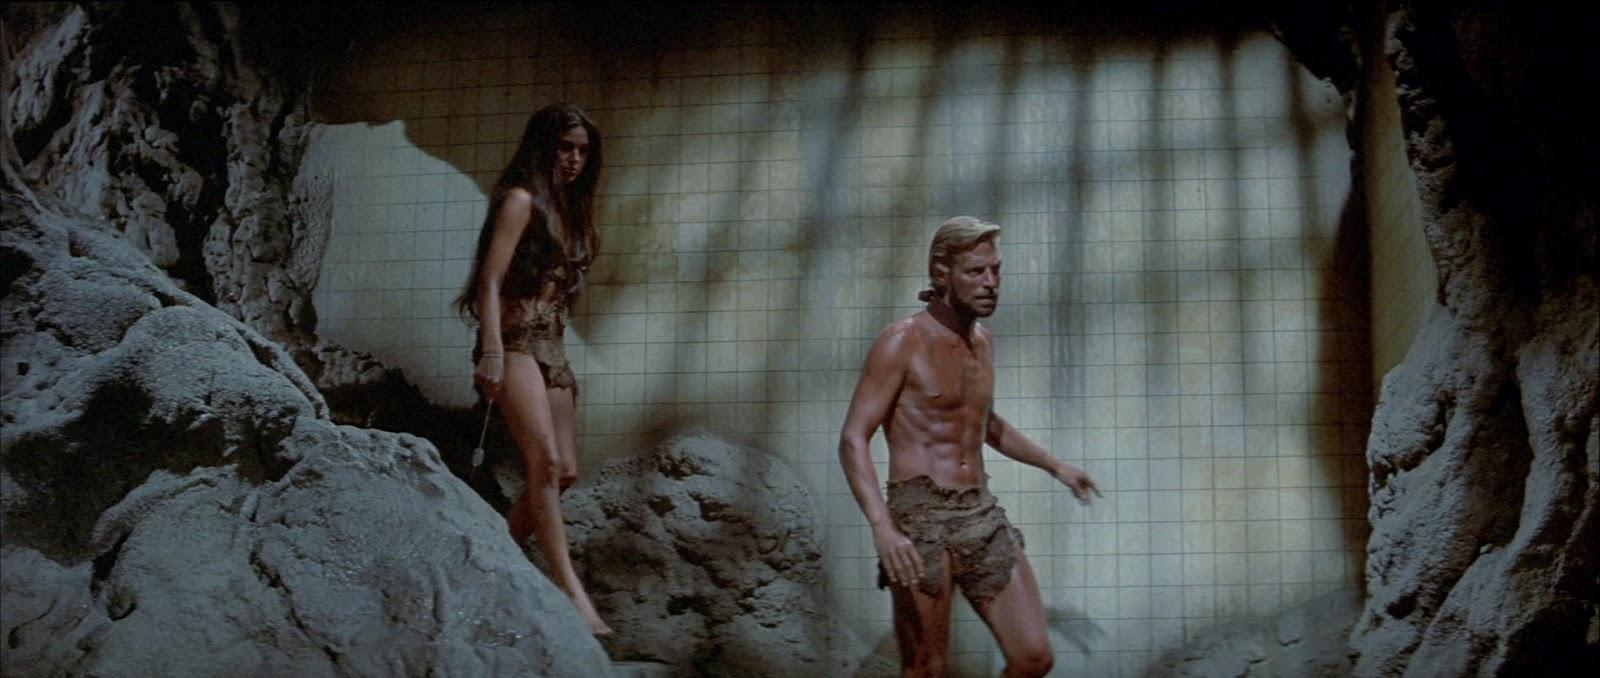 James franciscus nude Nude Photos 59